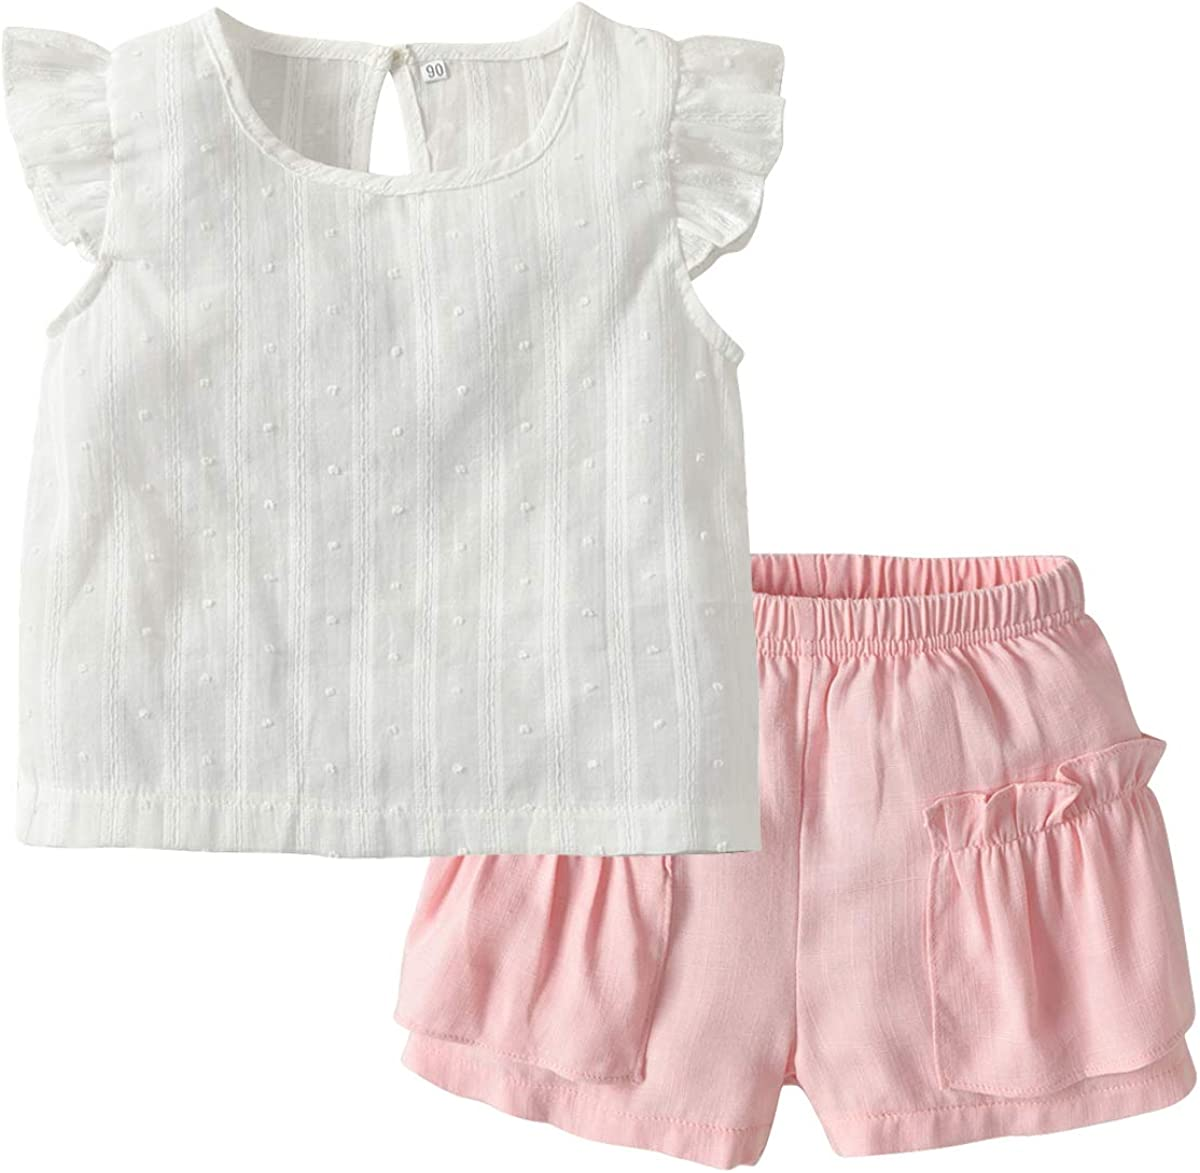 2PCS Set Toddler Kids Baby Girls Outfits Clothes T-Shirt Vest Tops+Shorts Pants